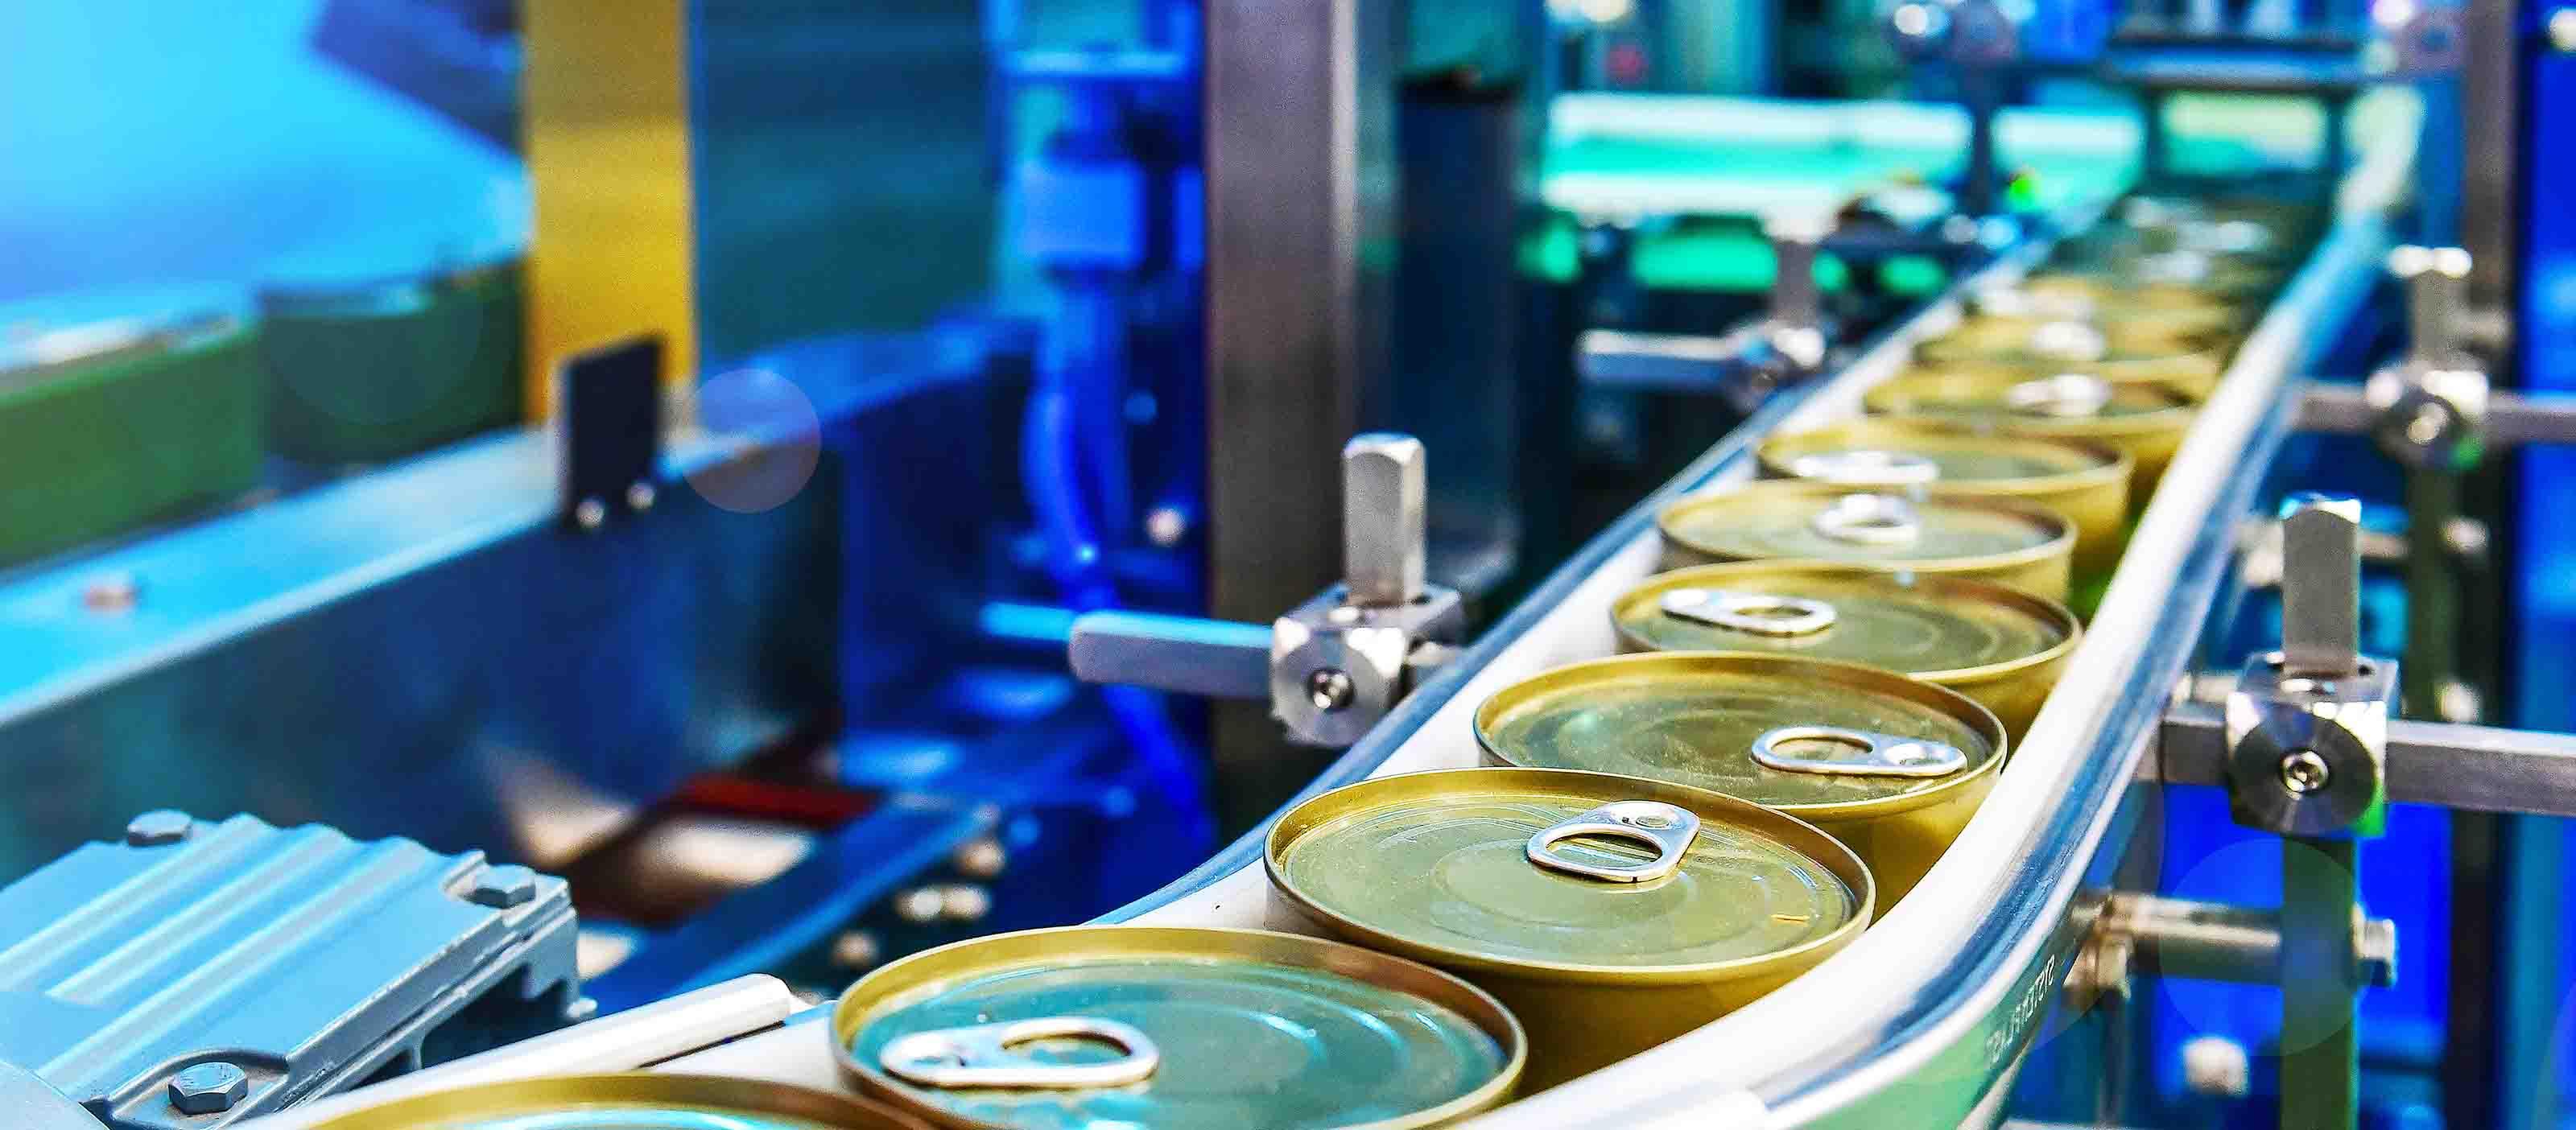 Software for Food & Beverage manufacturers | GE Digital | OEE & MES